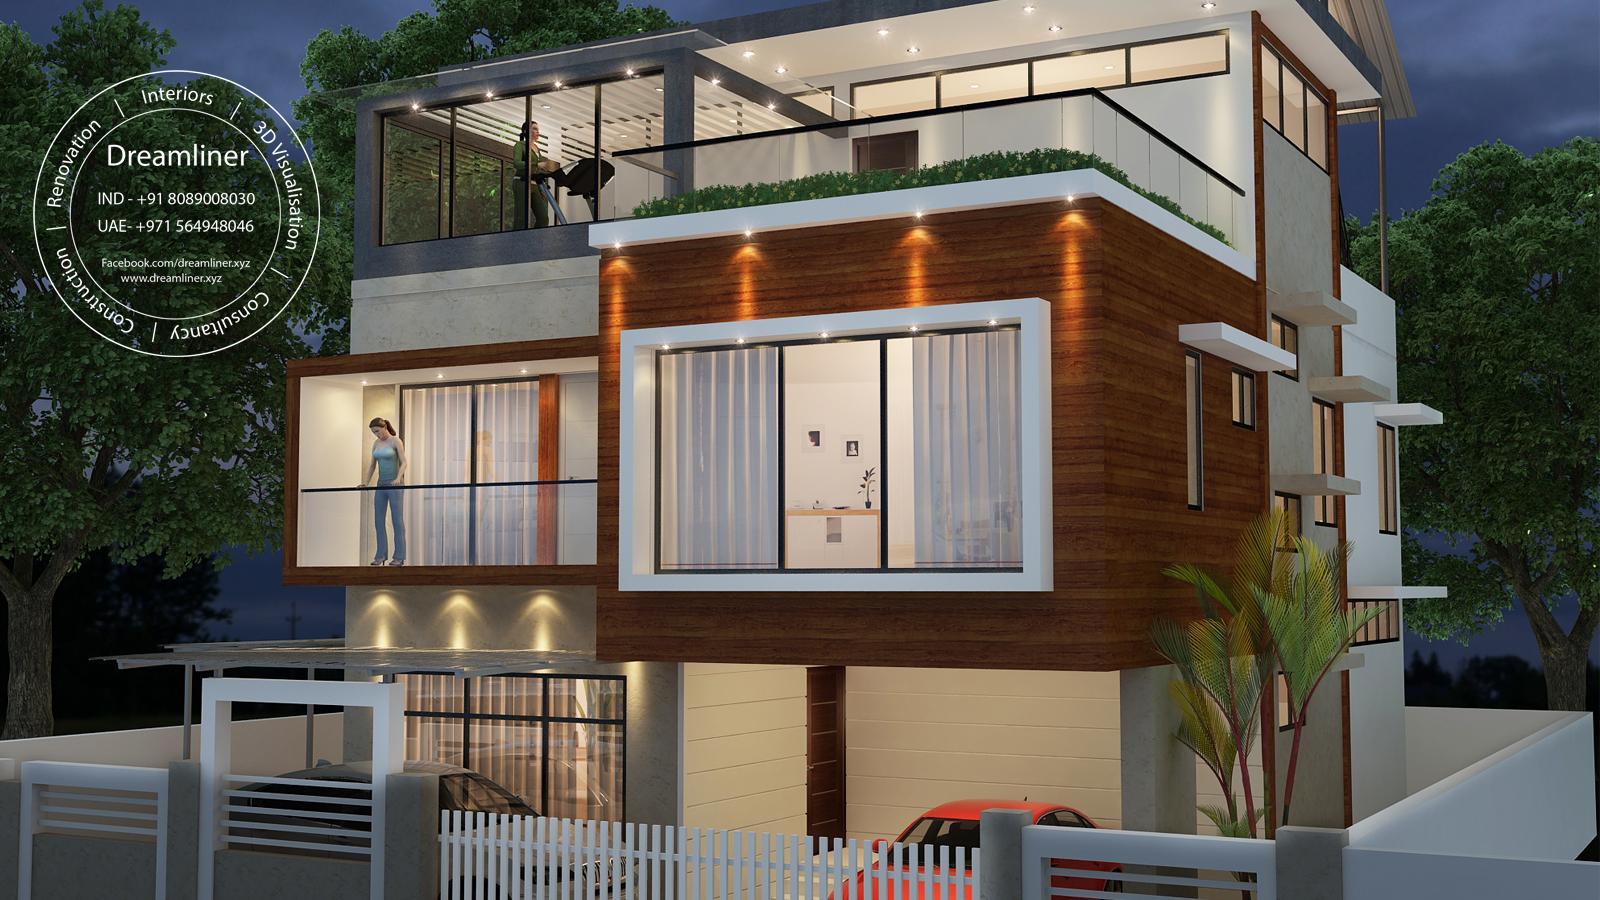 Stunning New Look For An Old House In Cochin Elamakkara Kochi Kerala India,Window Treatment Types Of Window Coverings